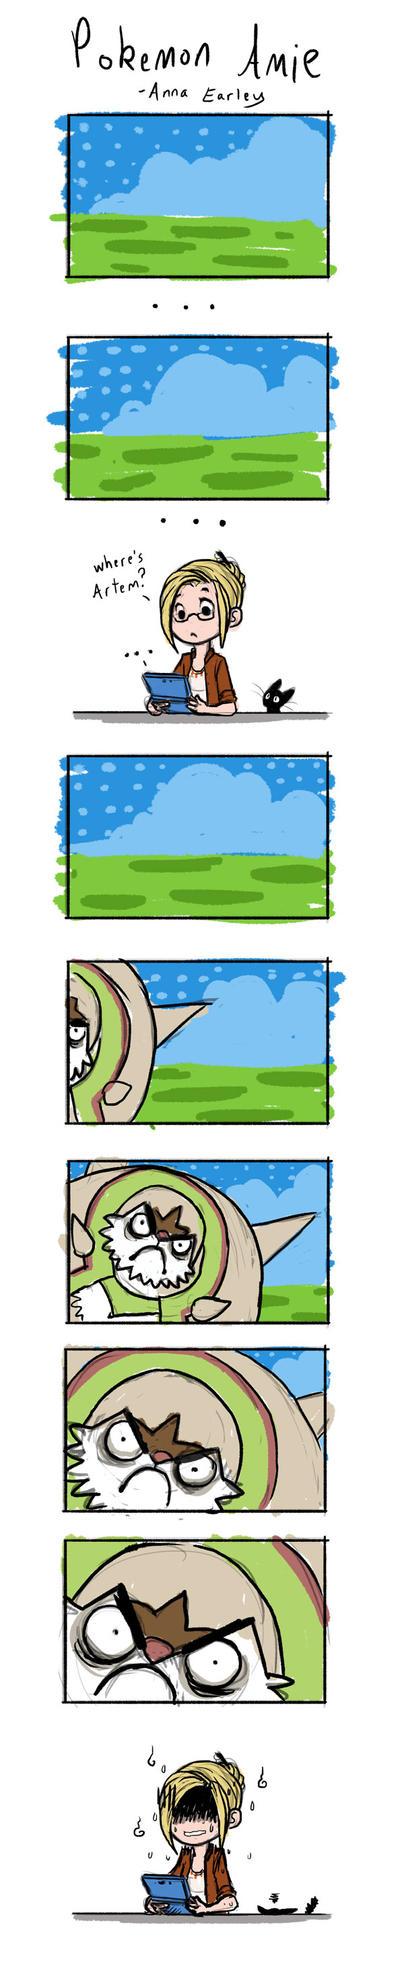 Pokemon Amie is kind of strange by Turtle-Arts